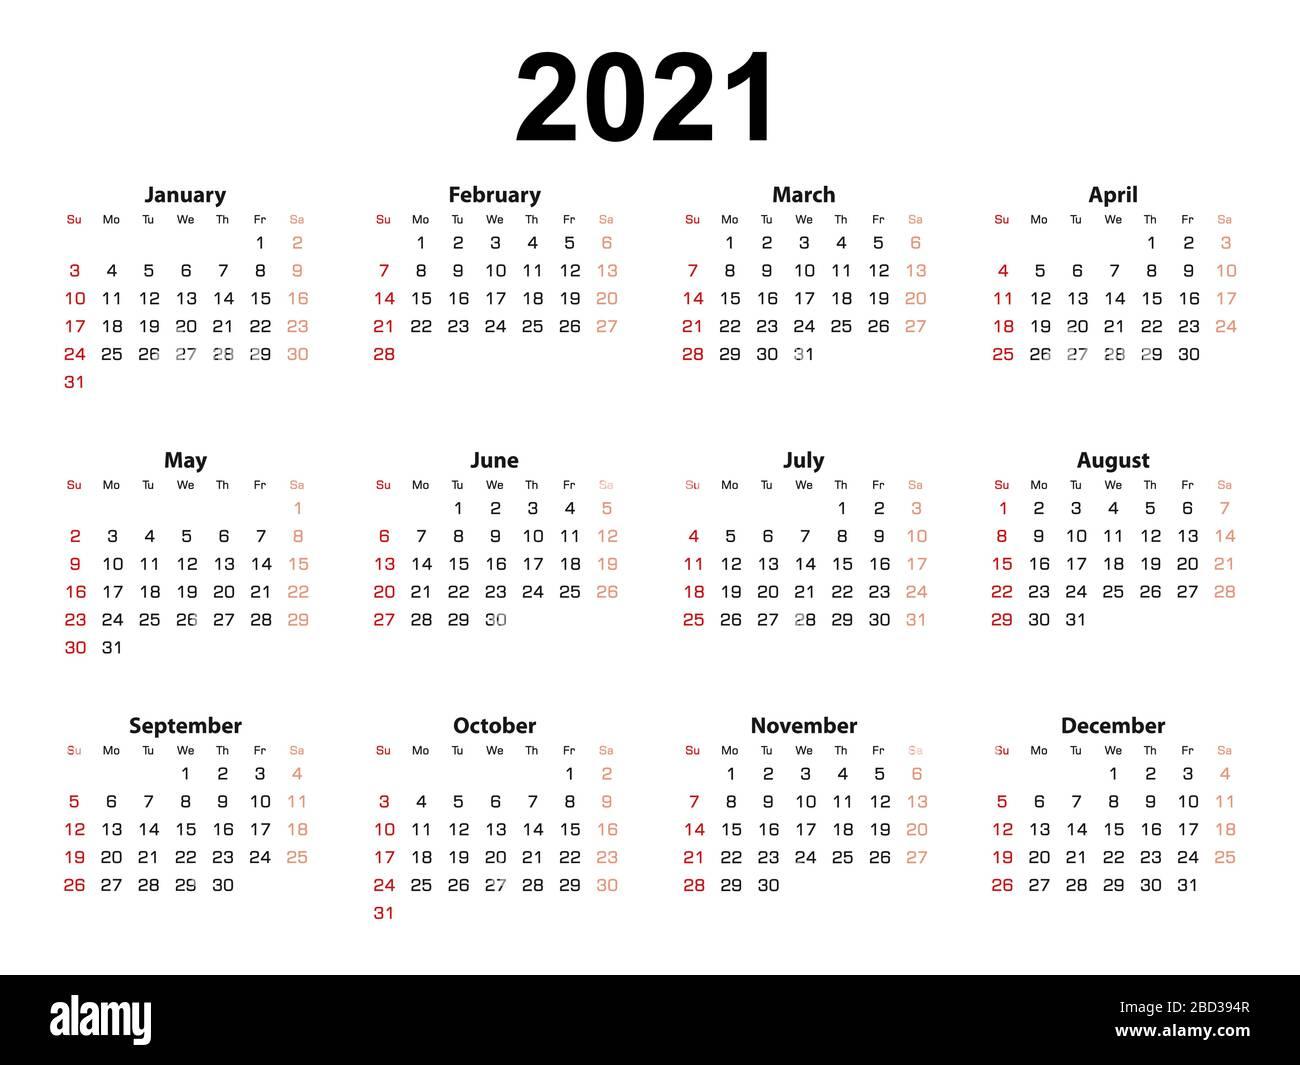 2021 Calendar Sundays Photos